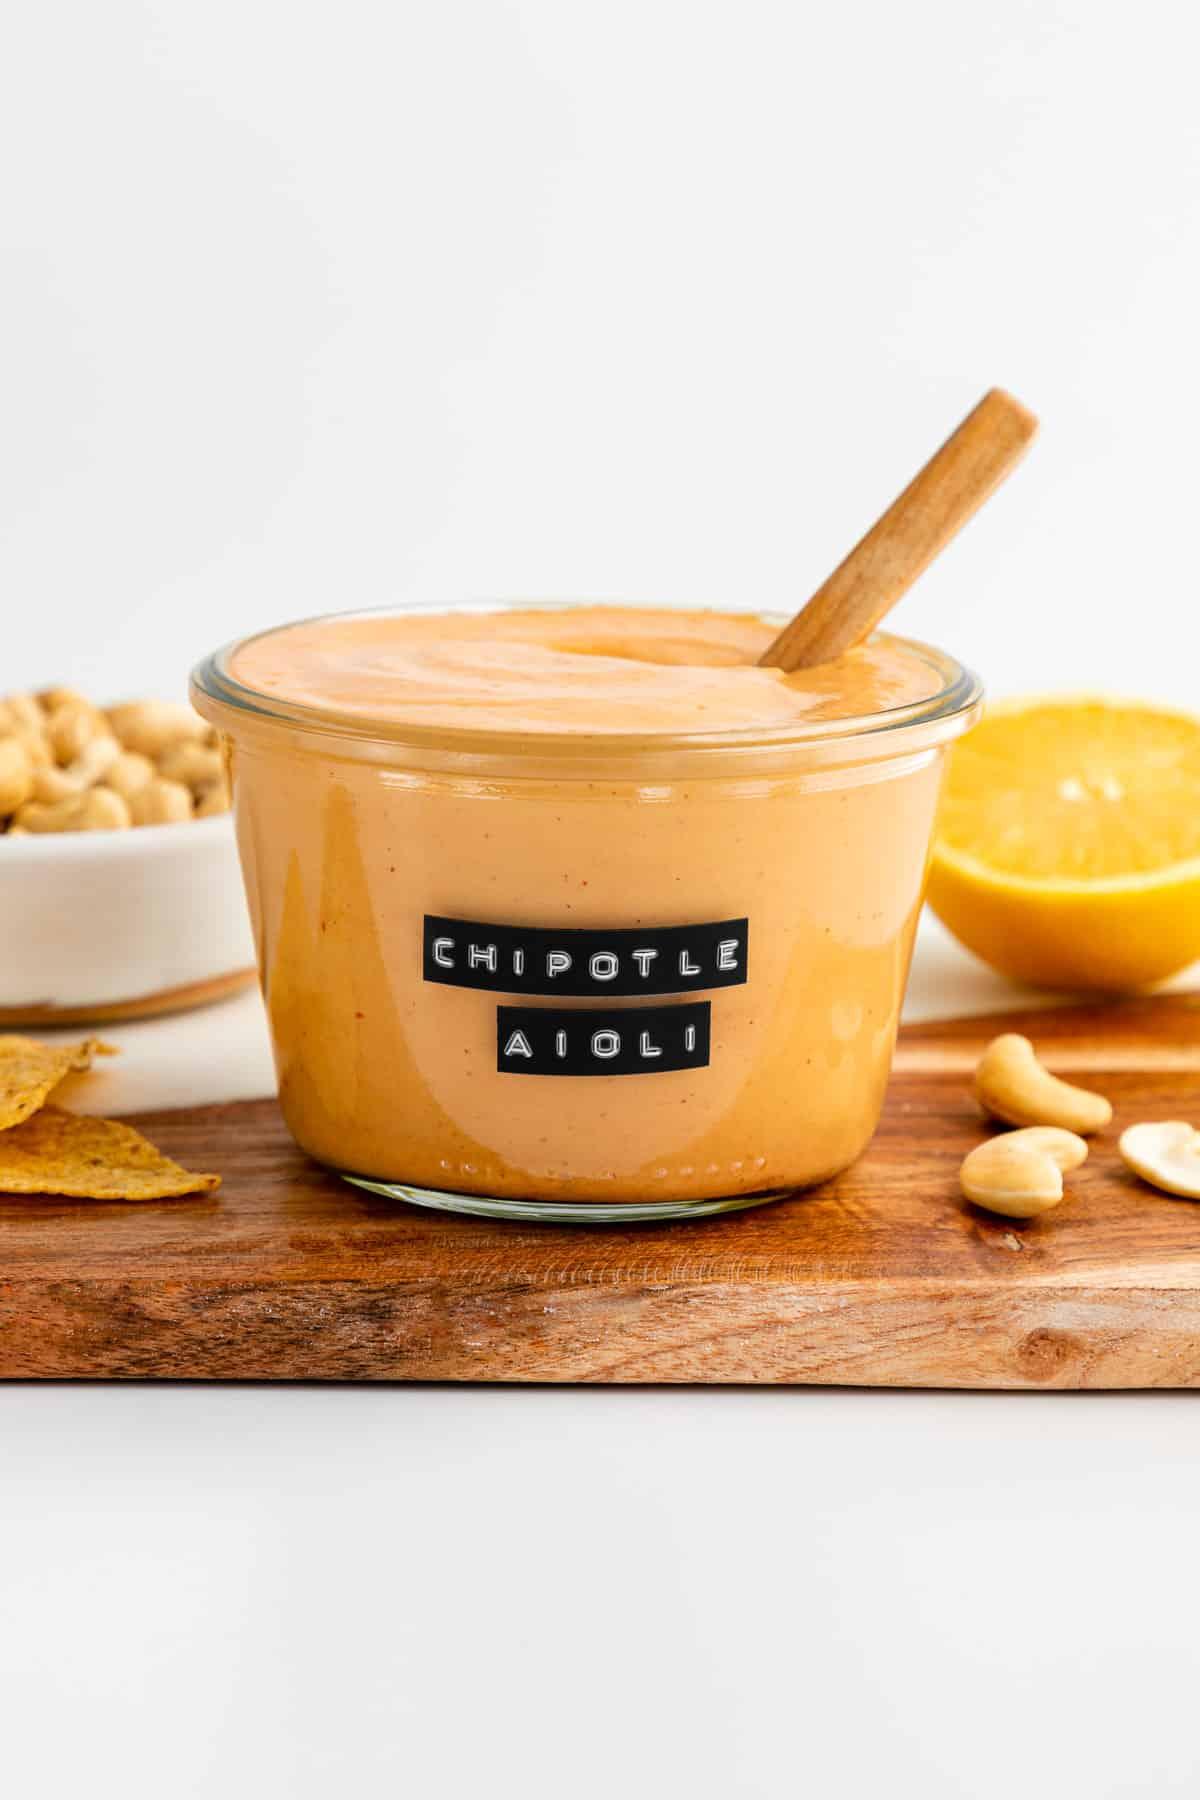 vegan chipotle sauce in a glass weck jar beside cashews and lemon